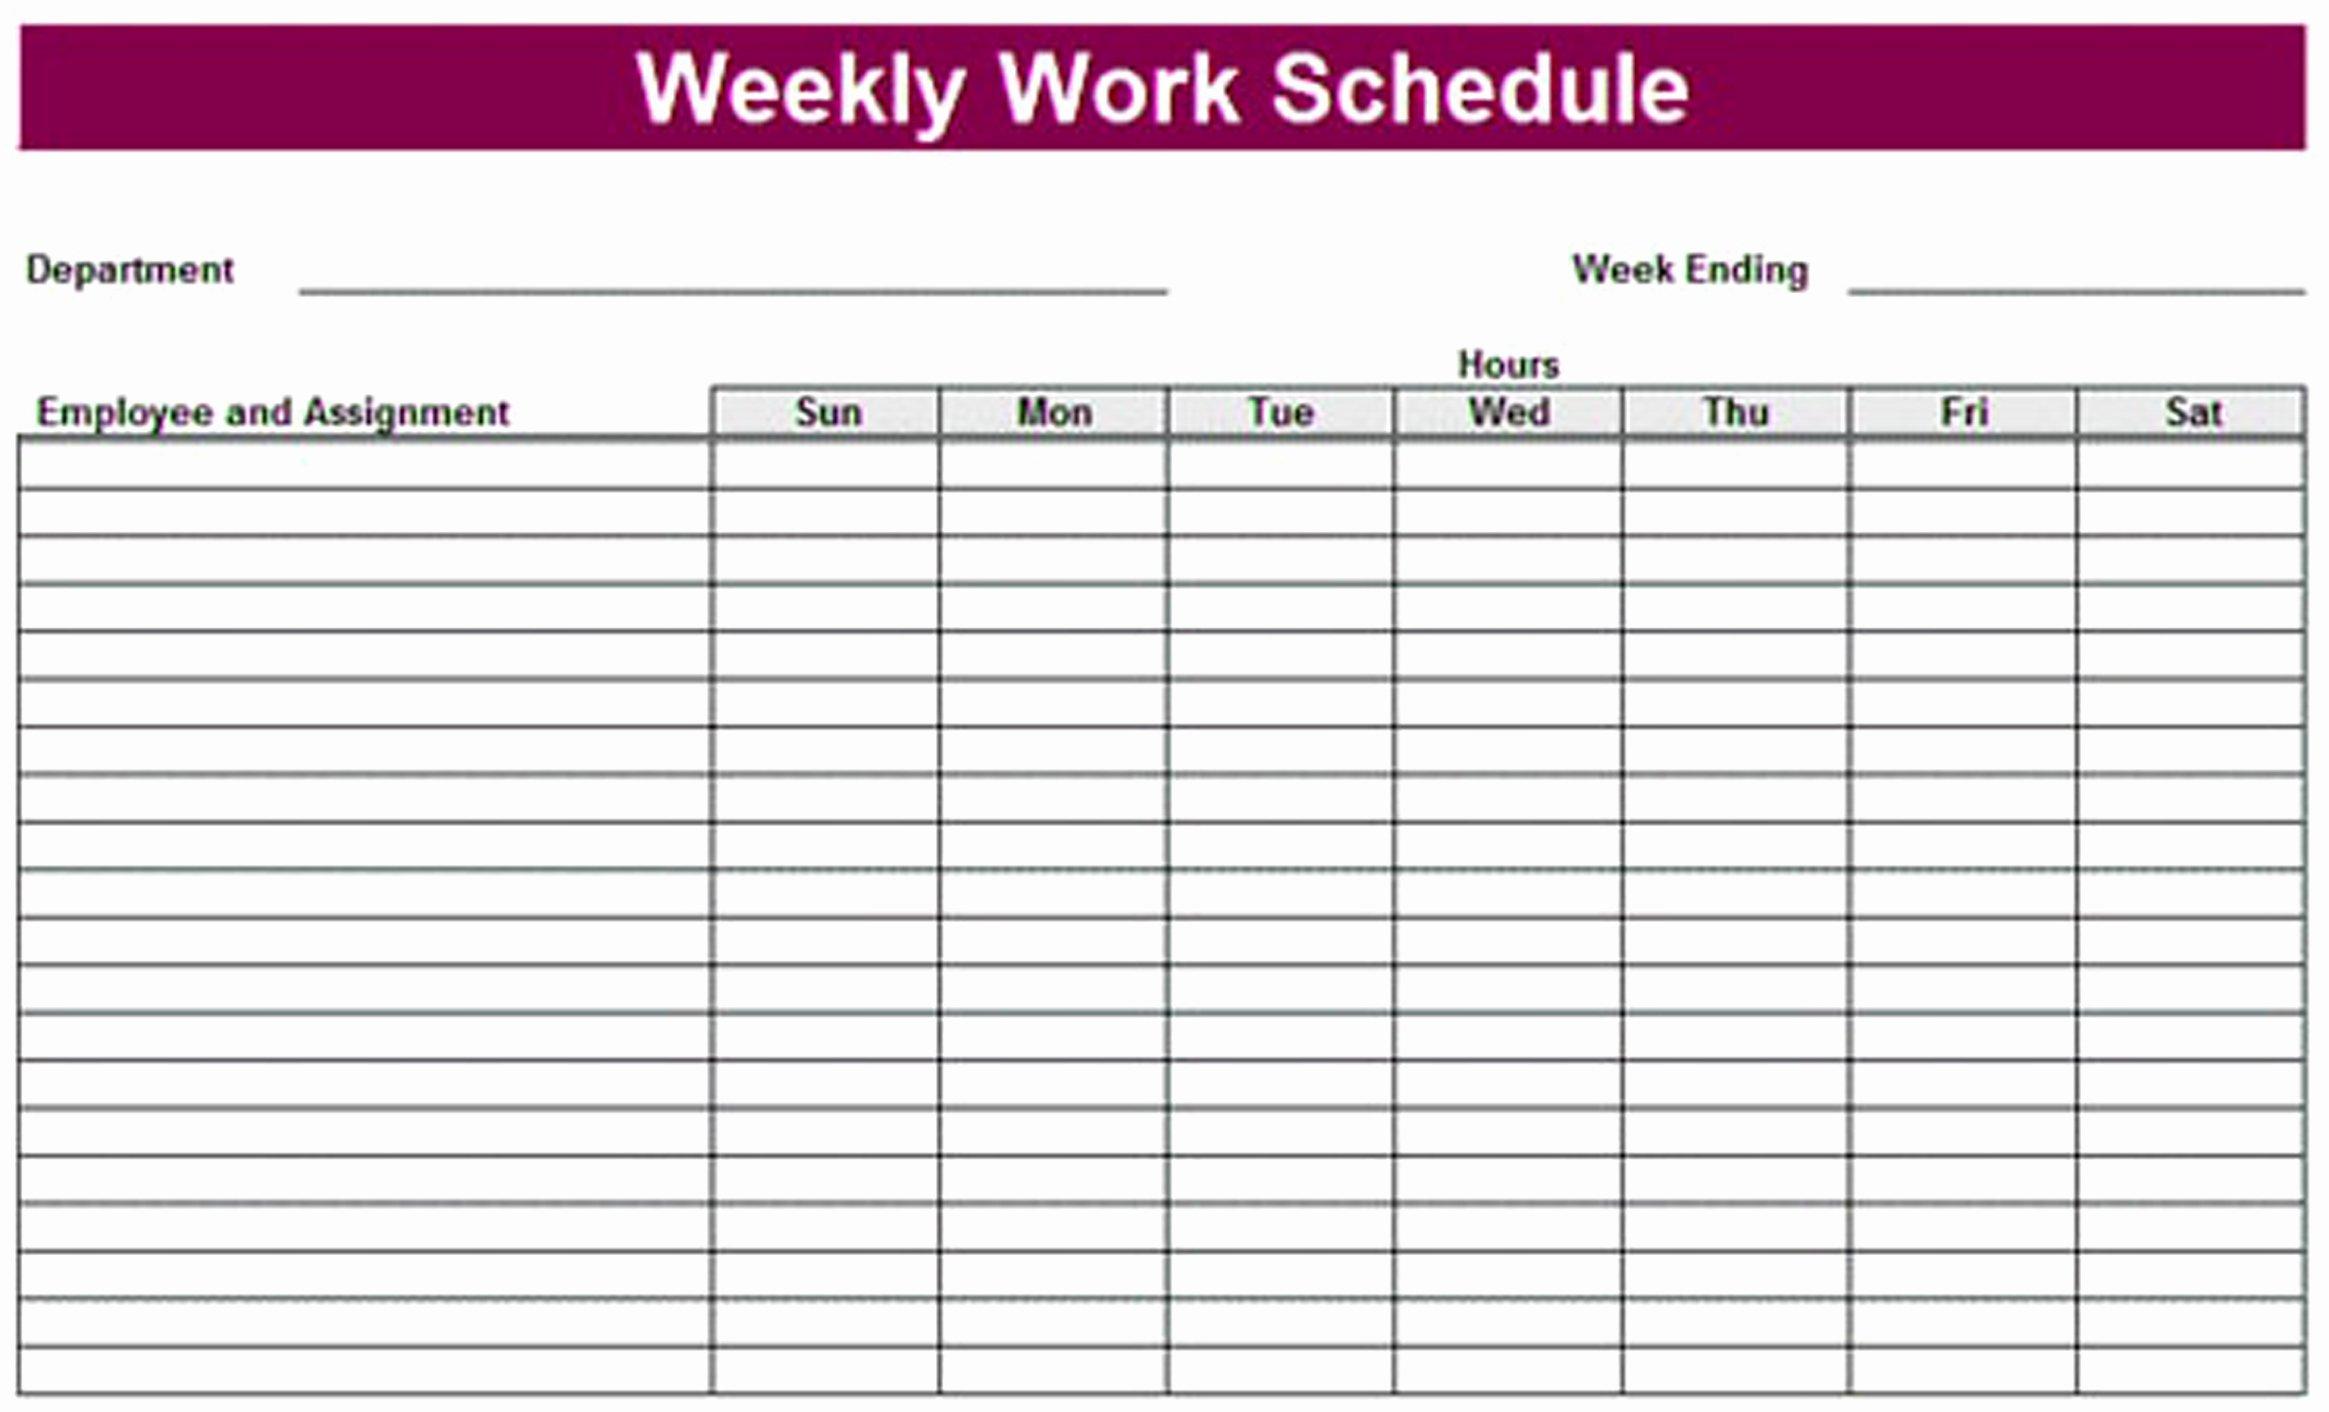 Work Schedule Calendar Template New Printable Weekly Schedule Template & Excel Planner